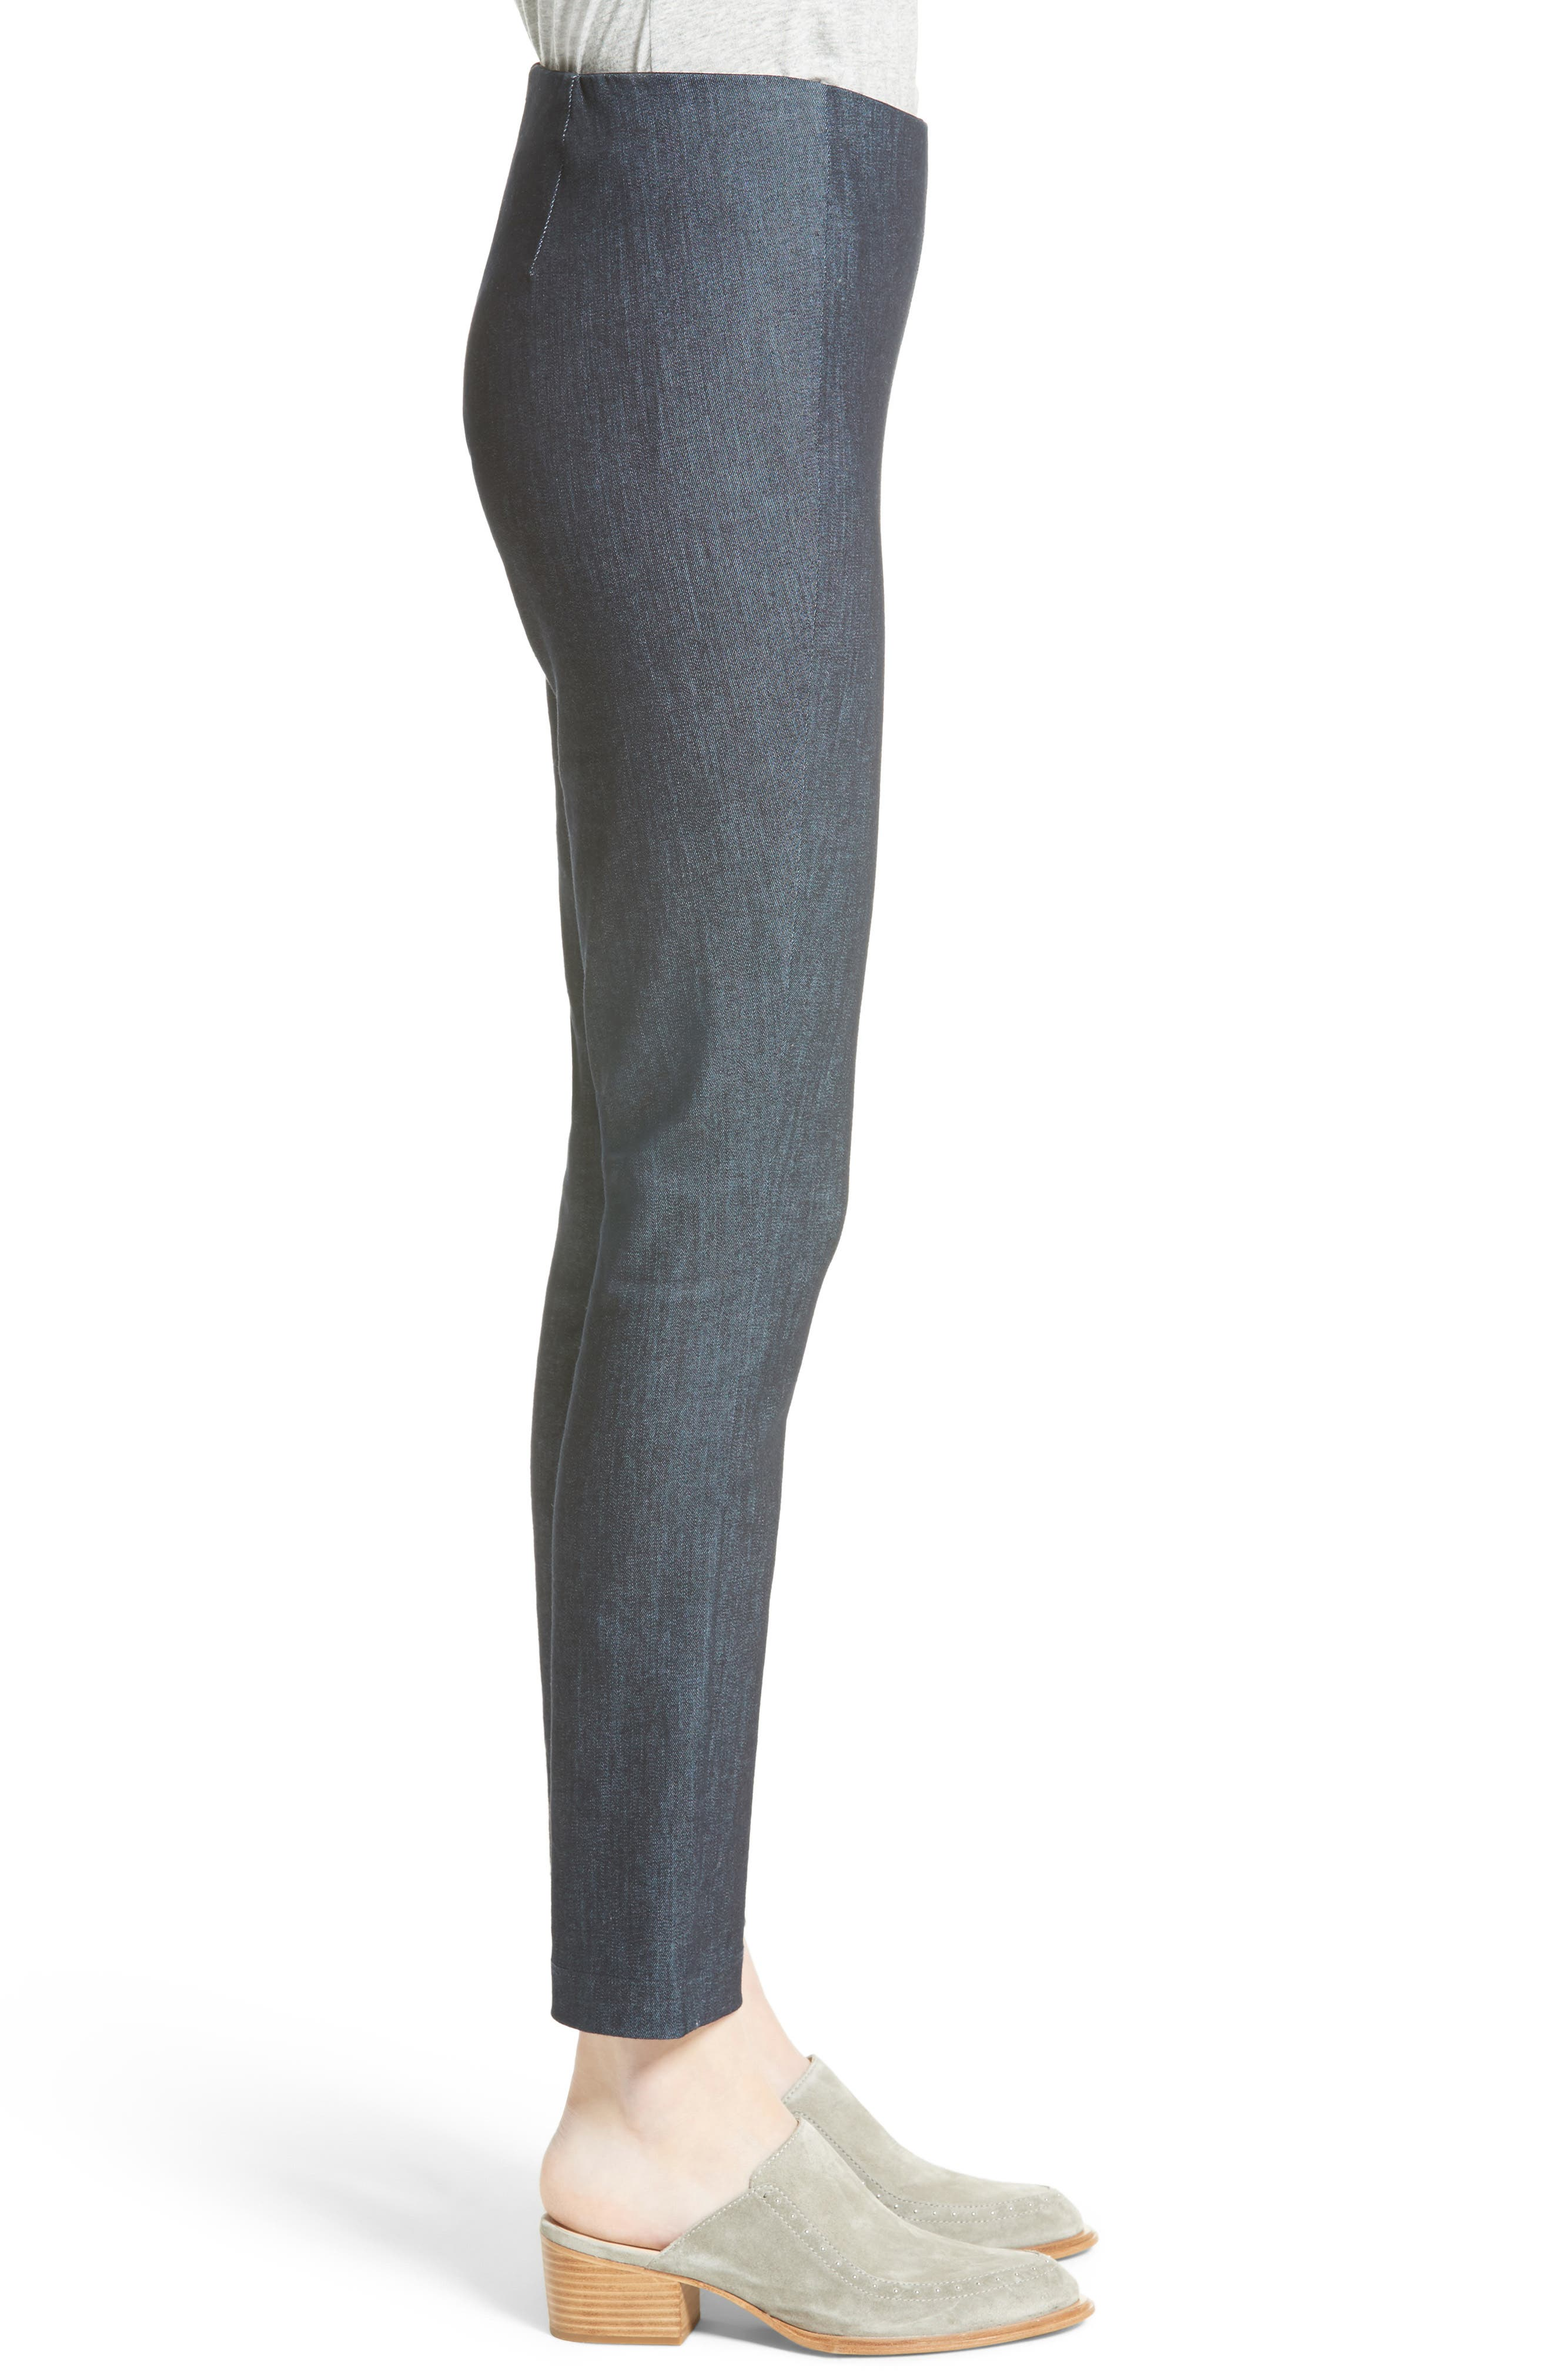 RAG & BONE, Simone Slim Ankle Pants, Alternate thumbnail 4, color, INDIGO